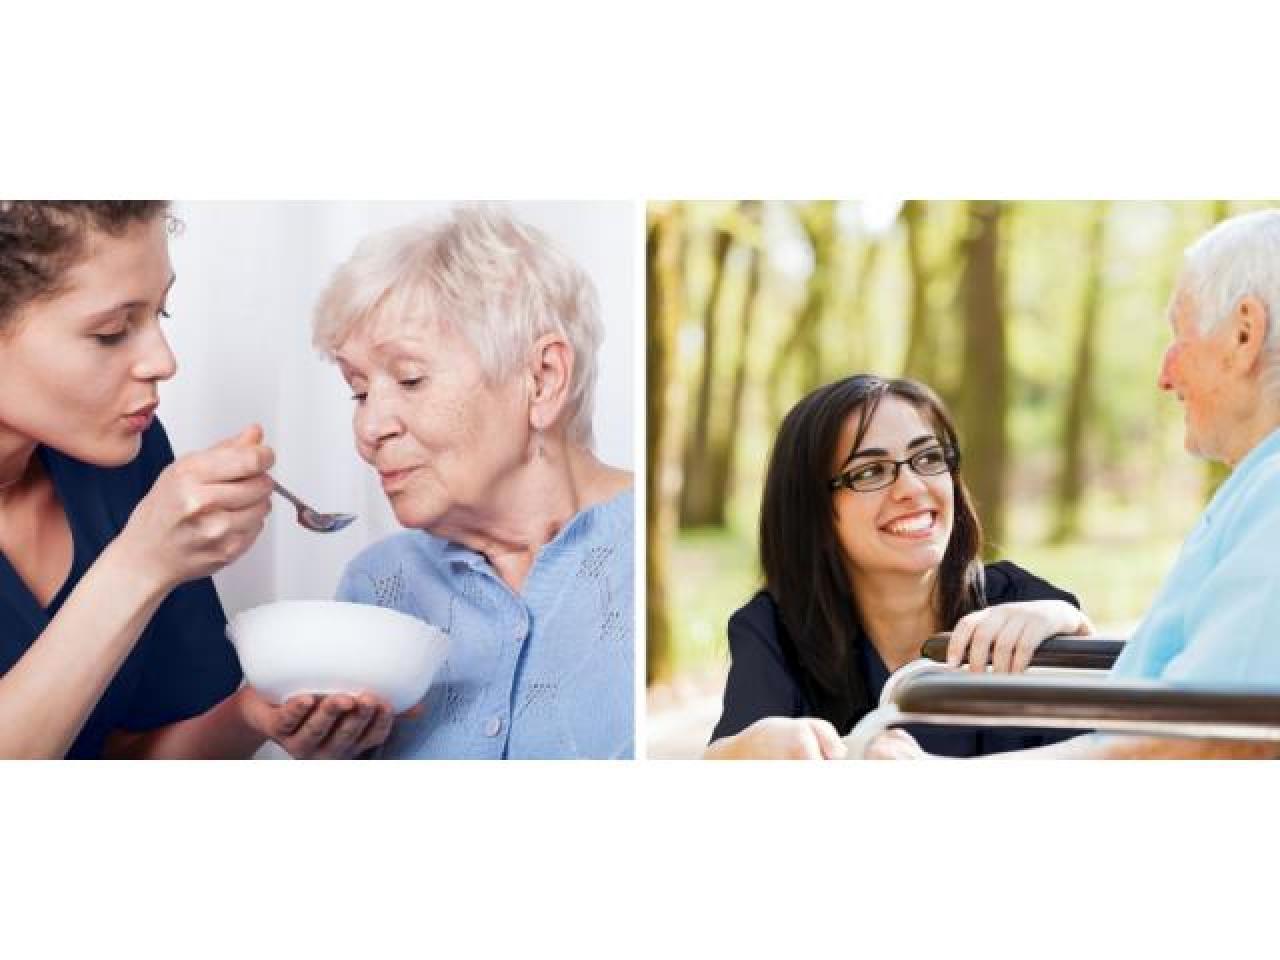 Работа в Англии «забота и поддержка пенсионеров» - 1